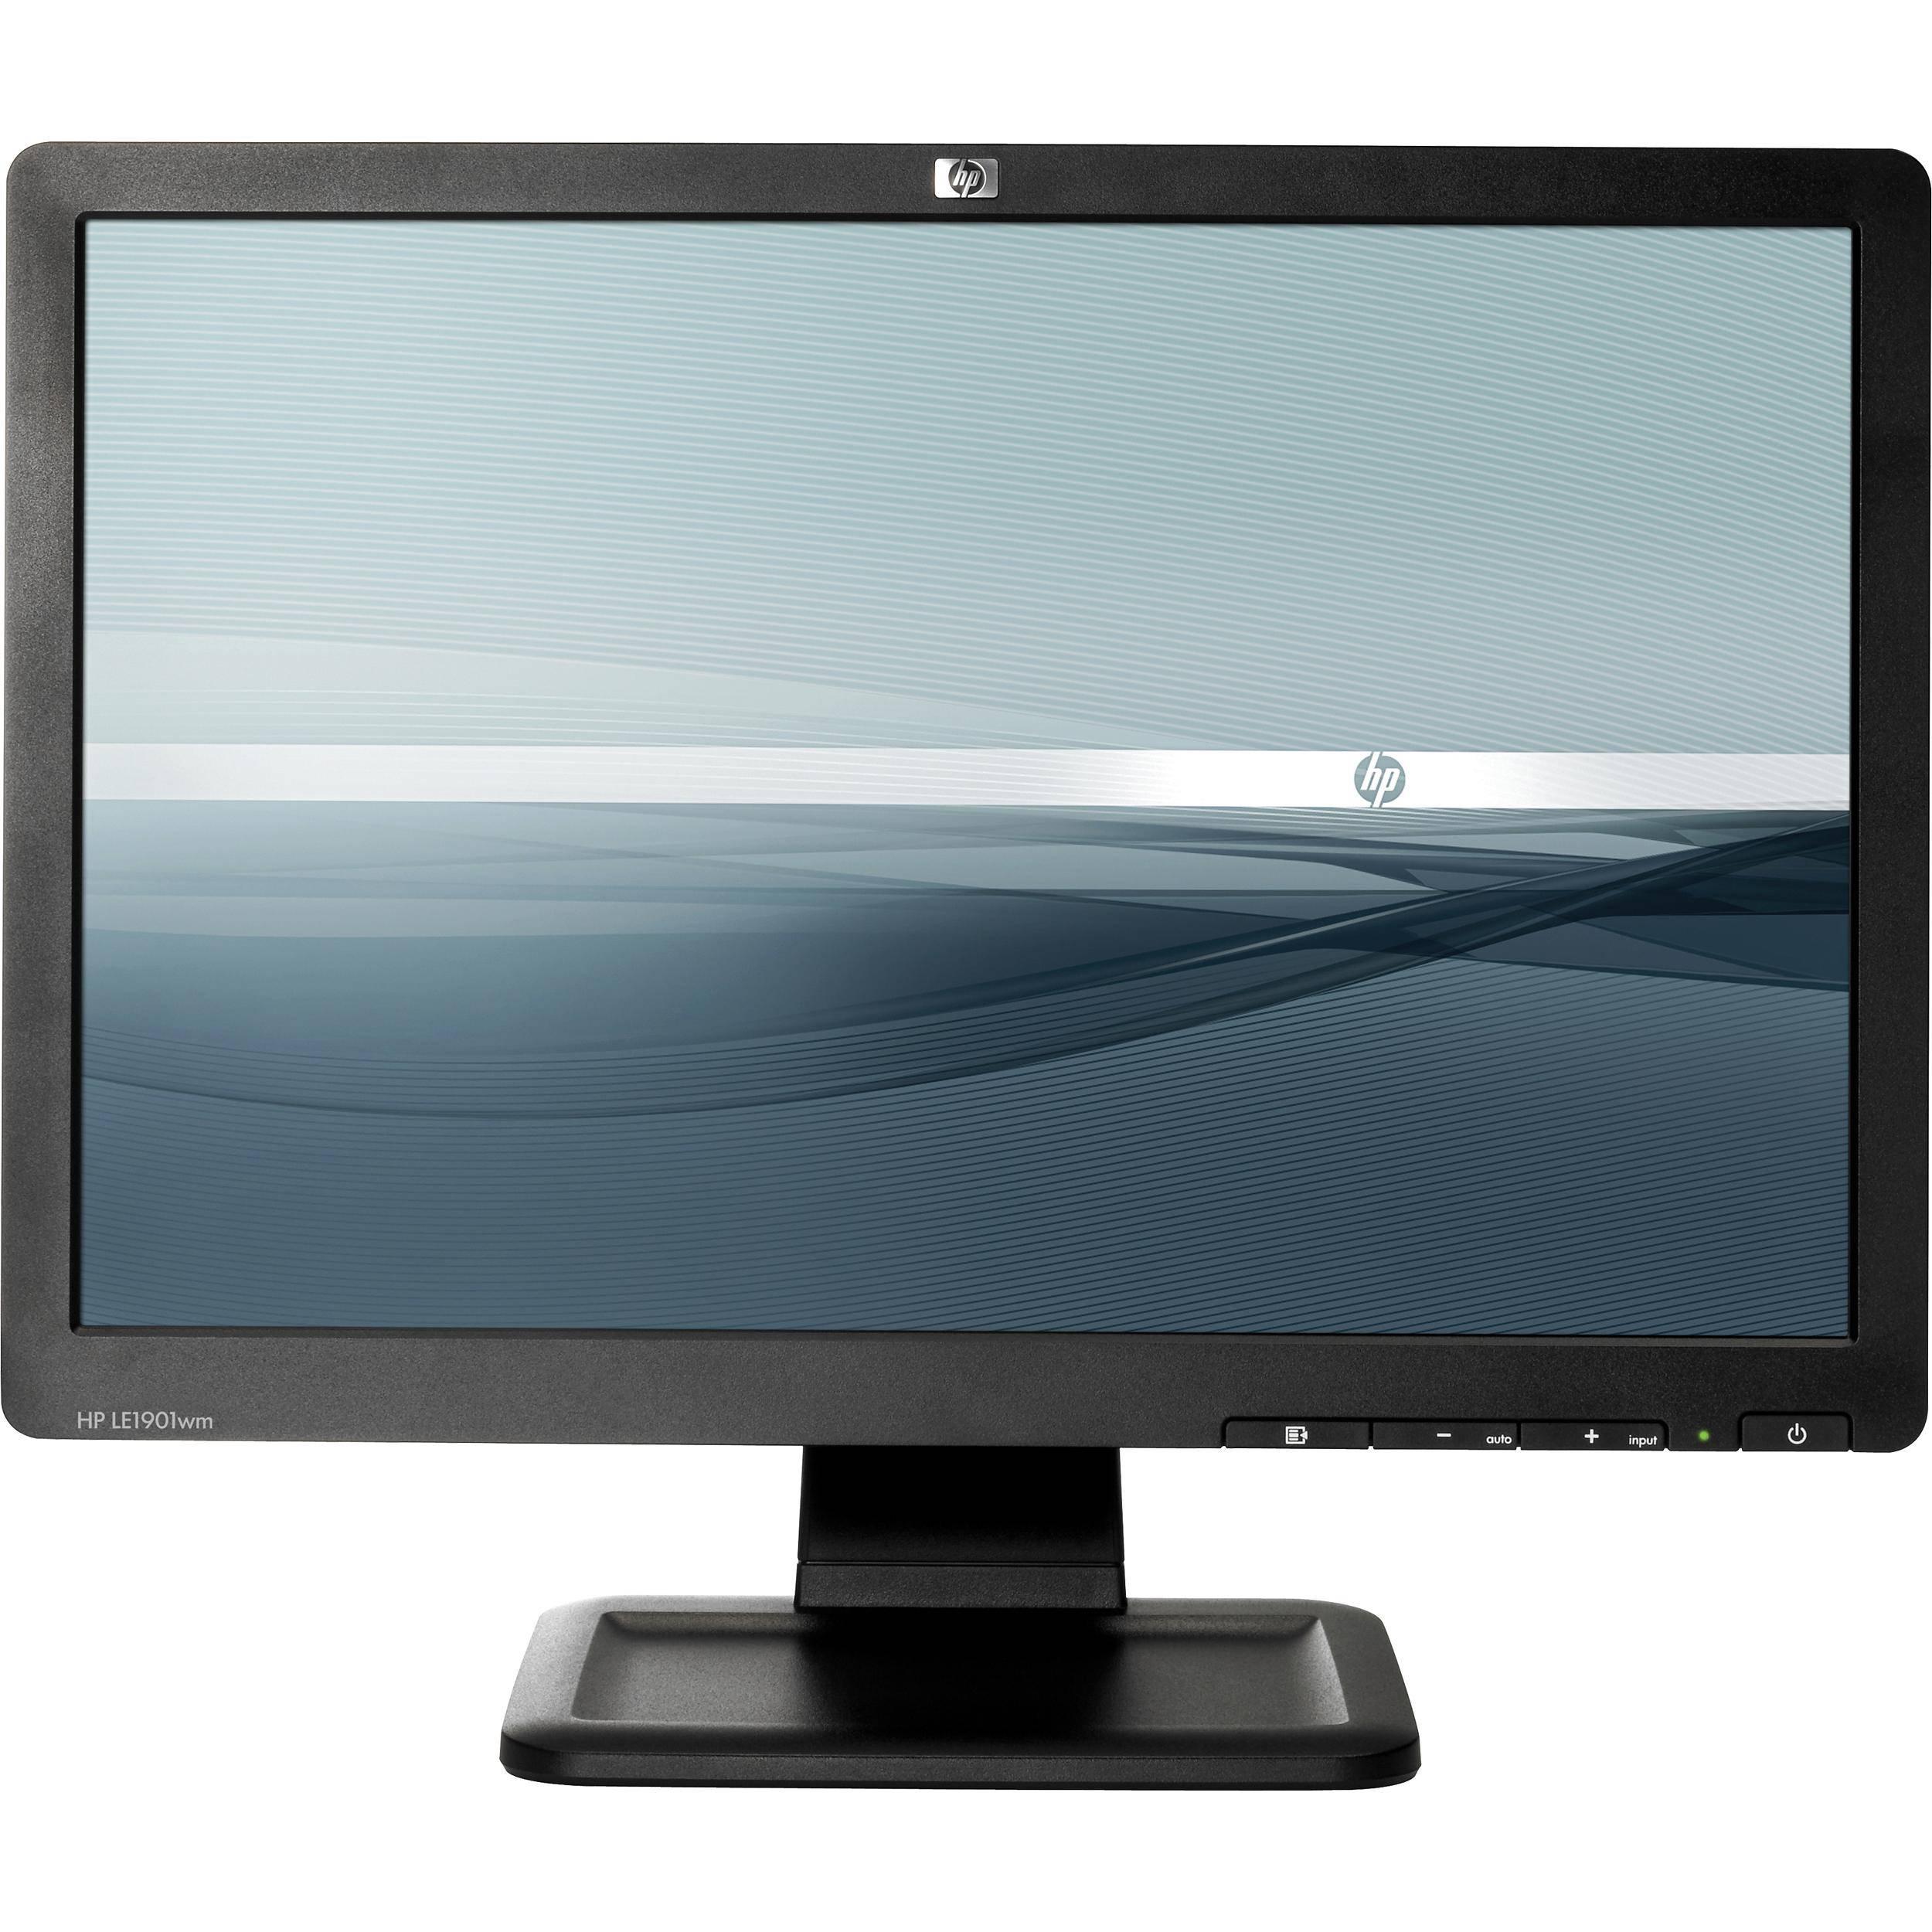 Hp Computer Monitors Built Speakers